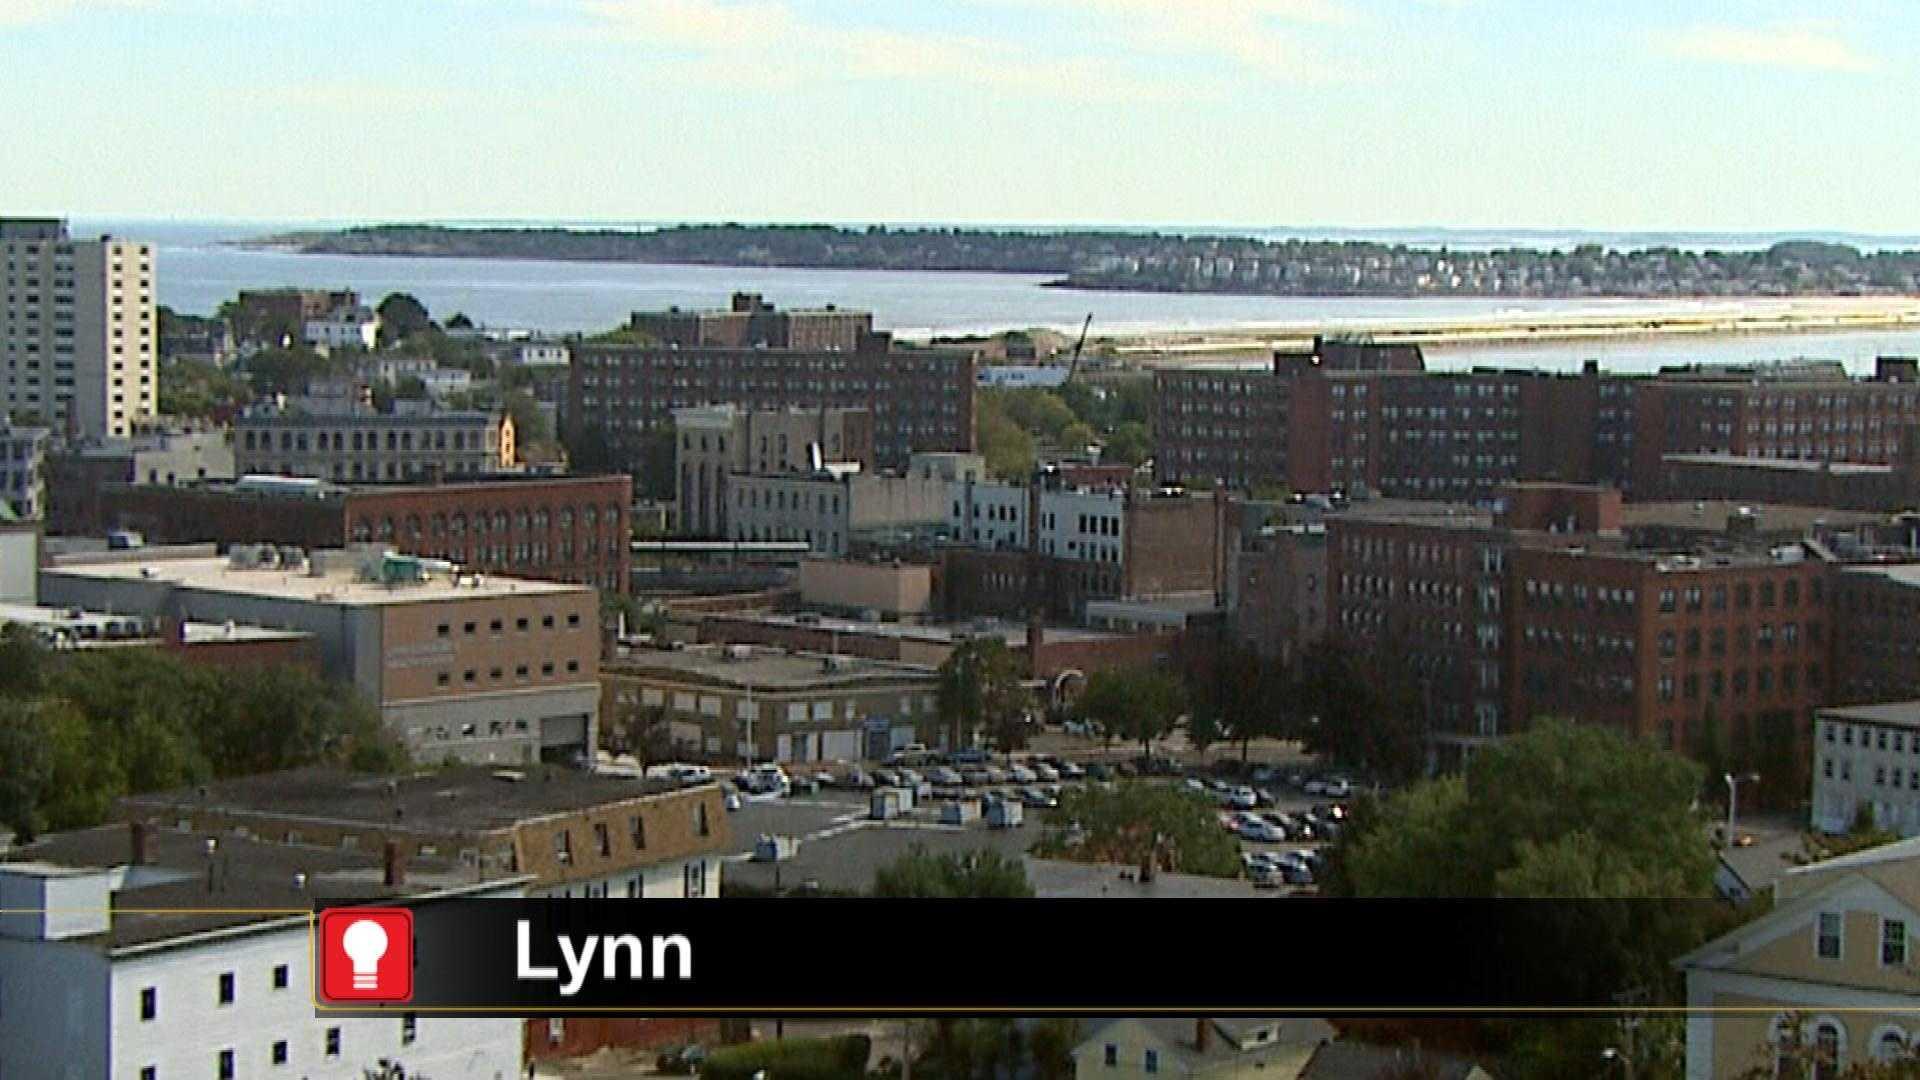 Lynn Image